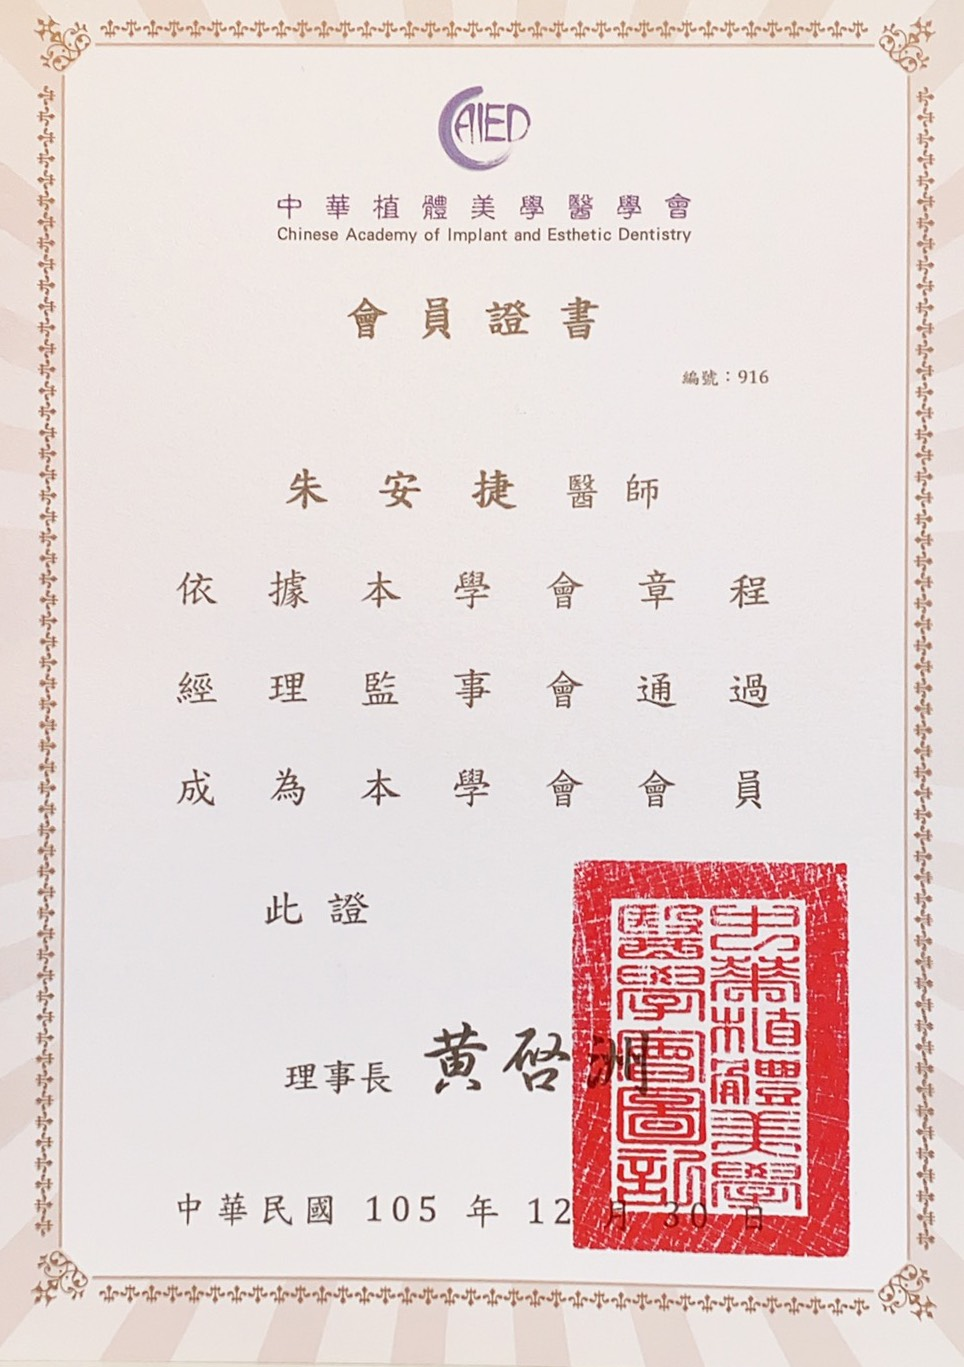 Dr朱-中華植體美學醫學會會員證書